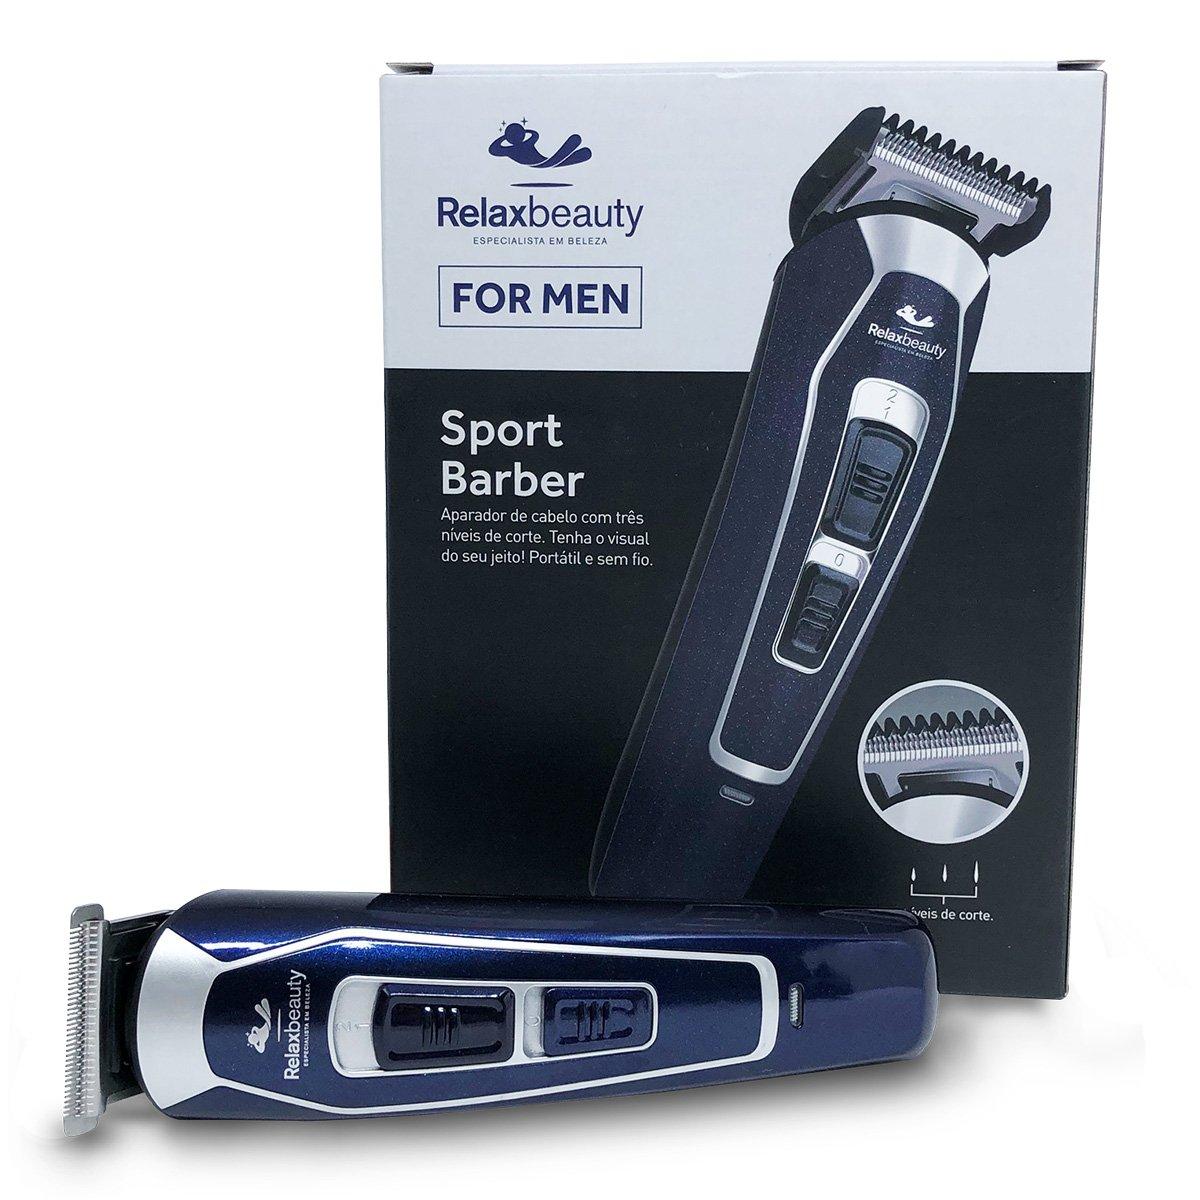 Aparador de Cabelo Relaxmedic Sport Barber